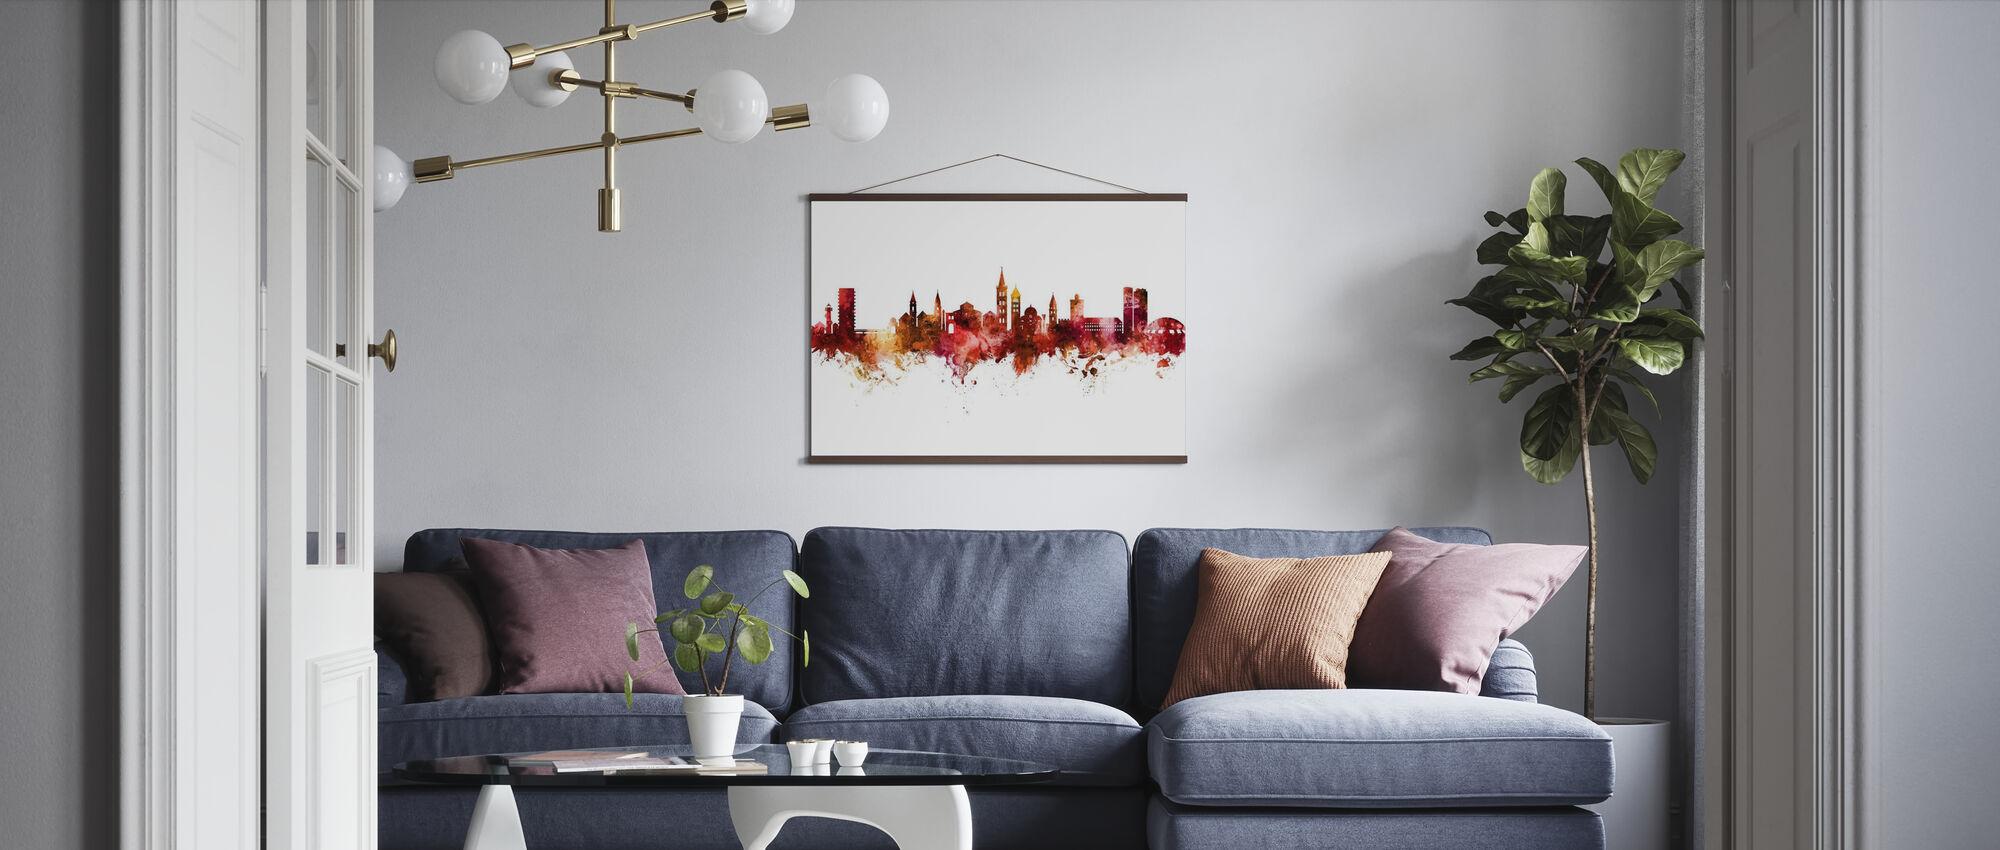 Zadar Croatia Skyline - Poster - Living Room